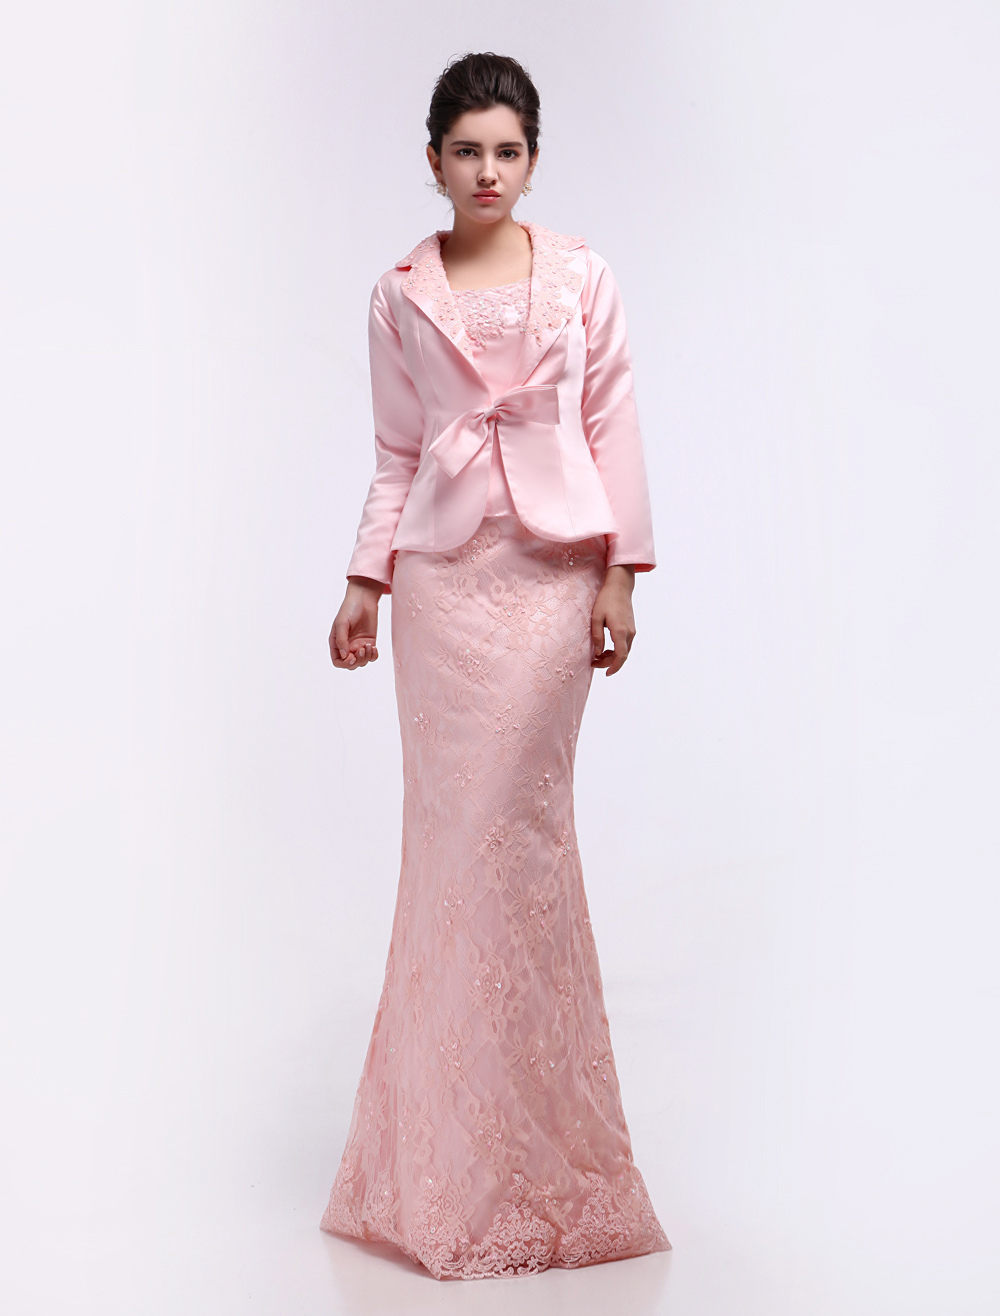 Pink Sheath Straps Neck Applique Mother of the Bride Dress (Wedding) photo